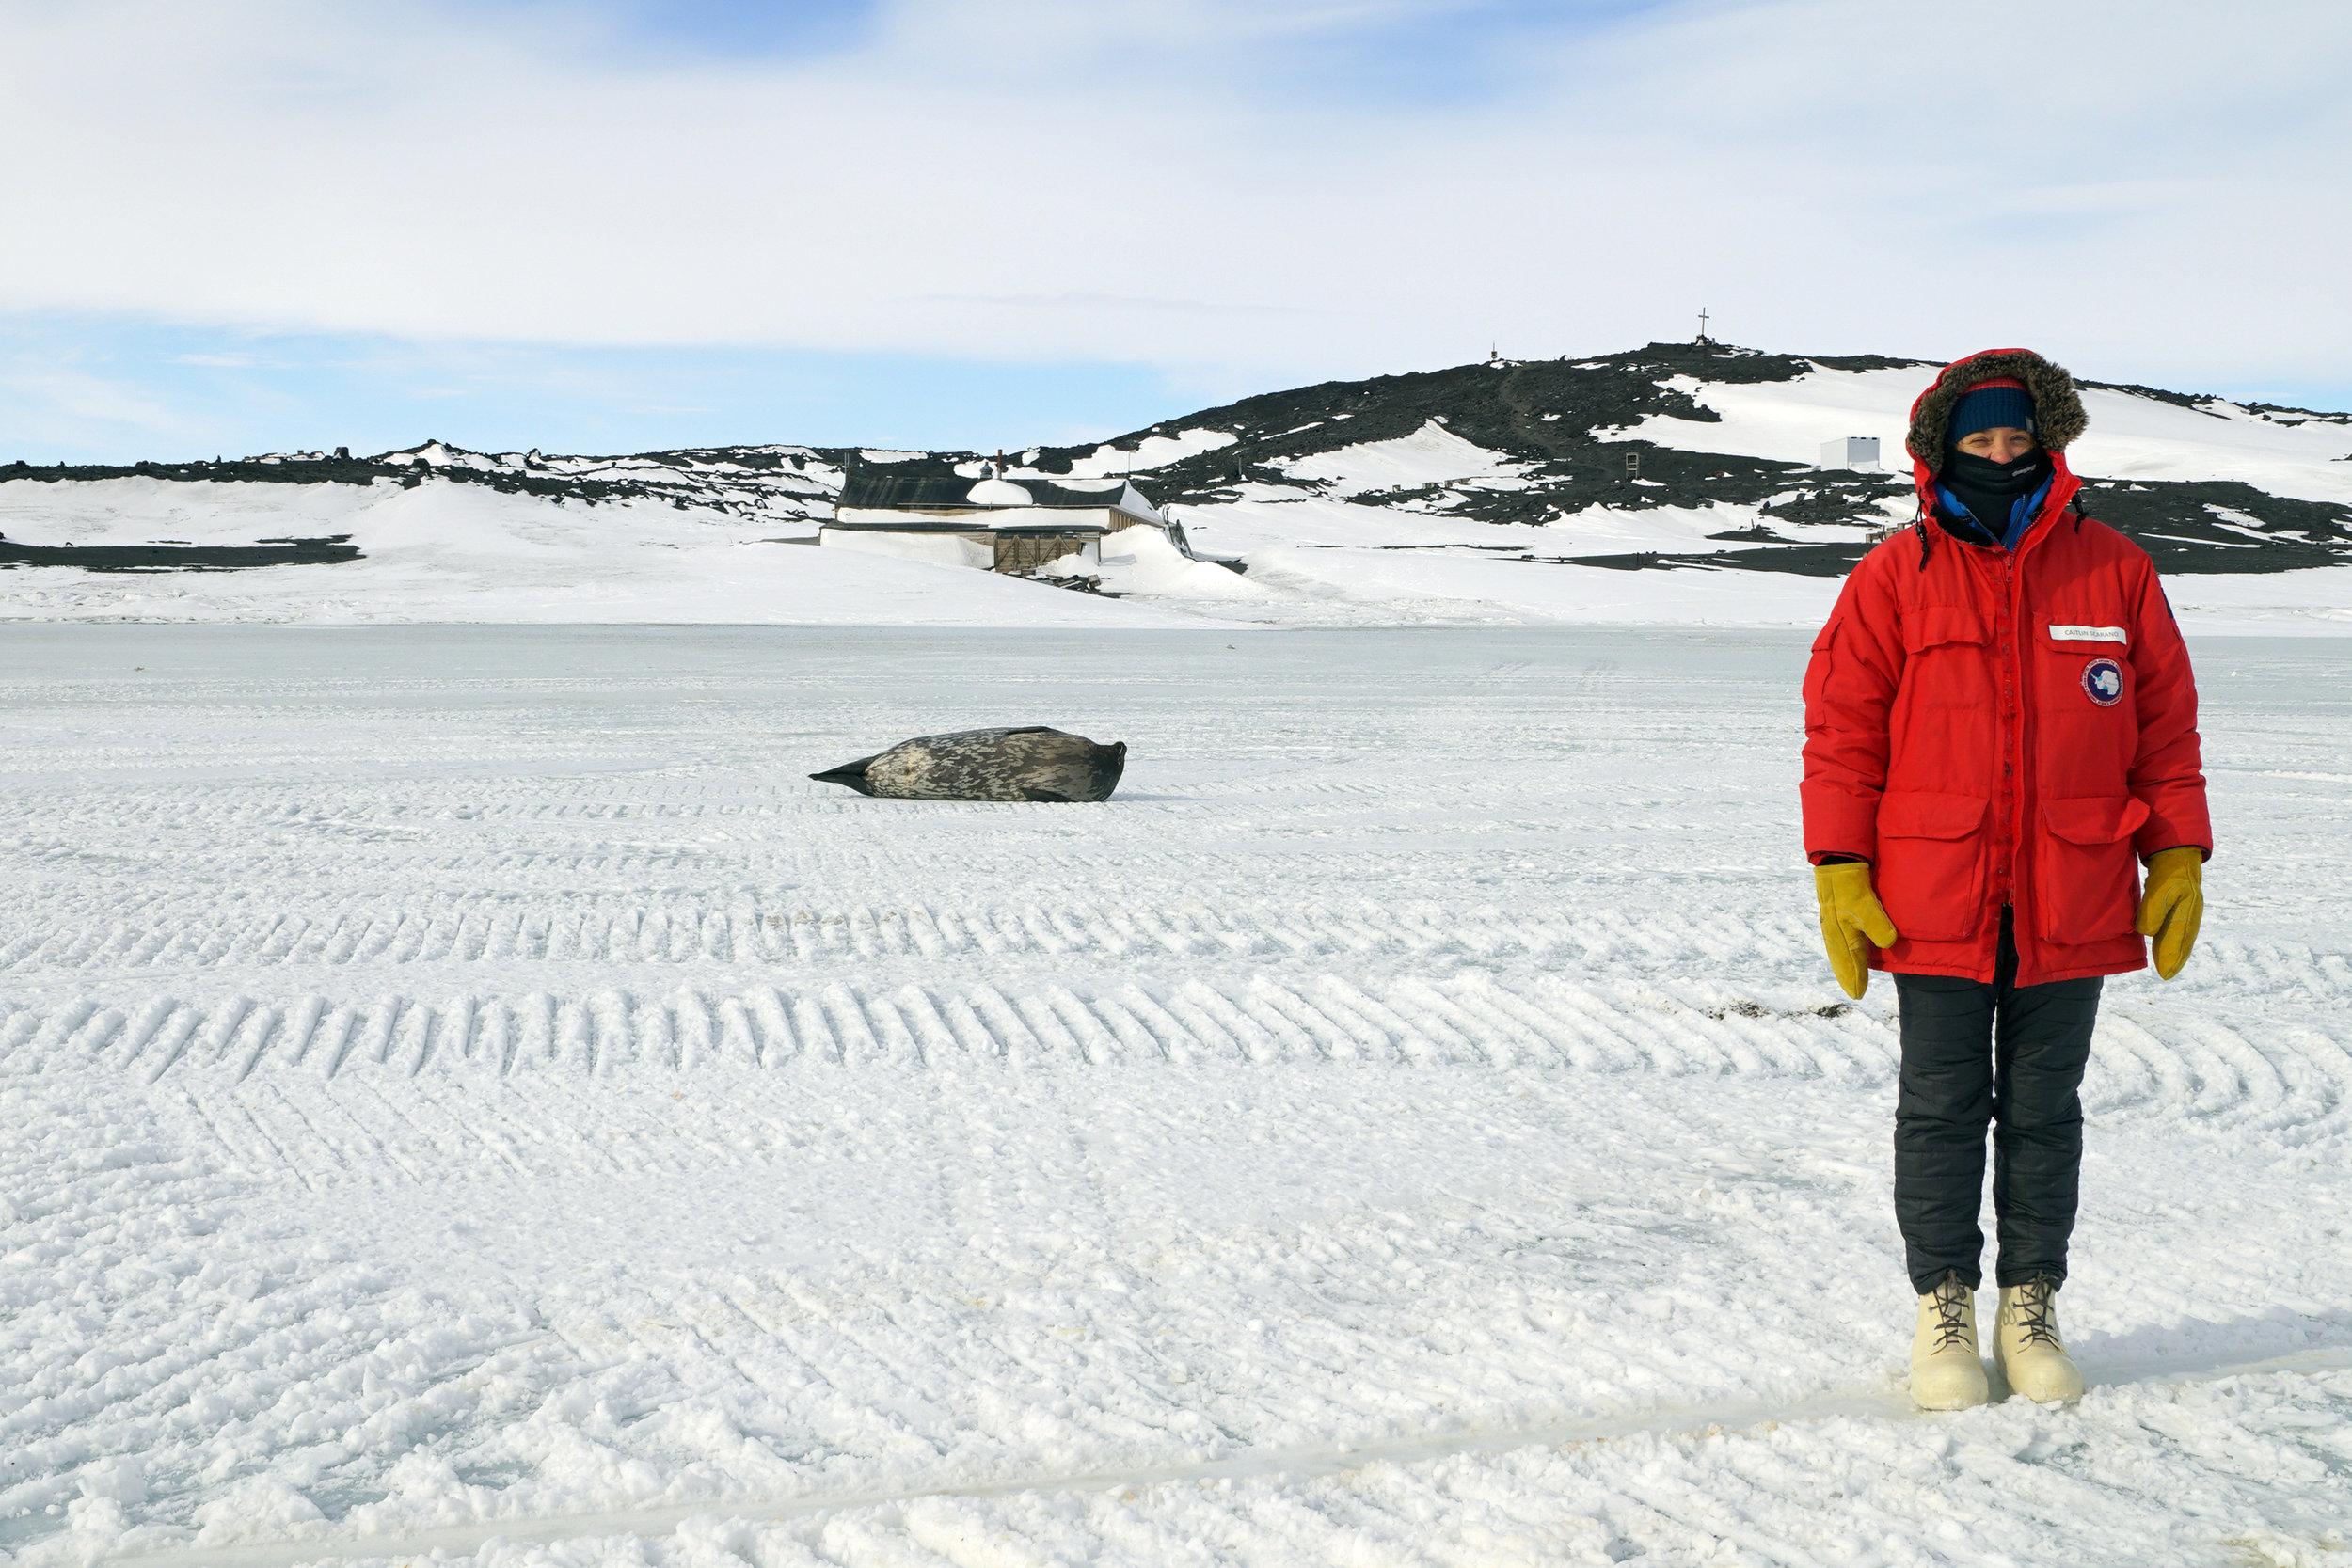 Weddell seal and Caitlin. Photo credit: Elaine Hood.